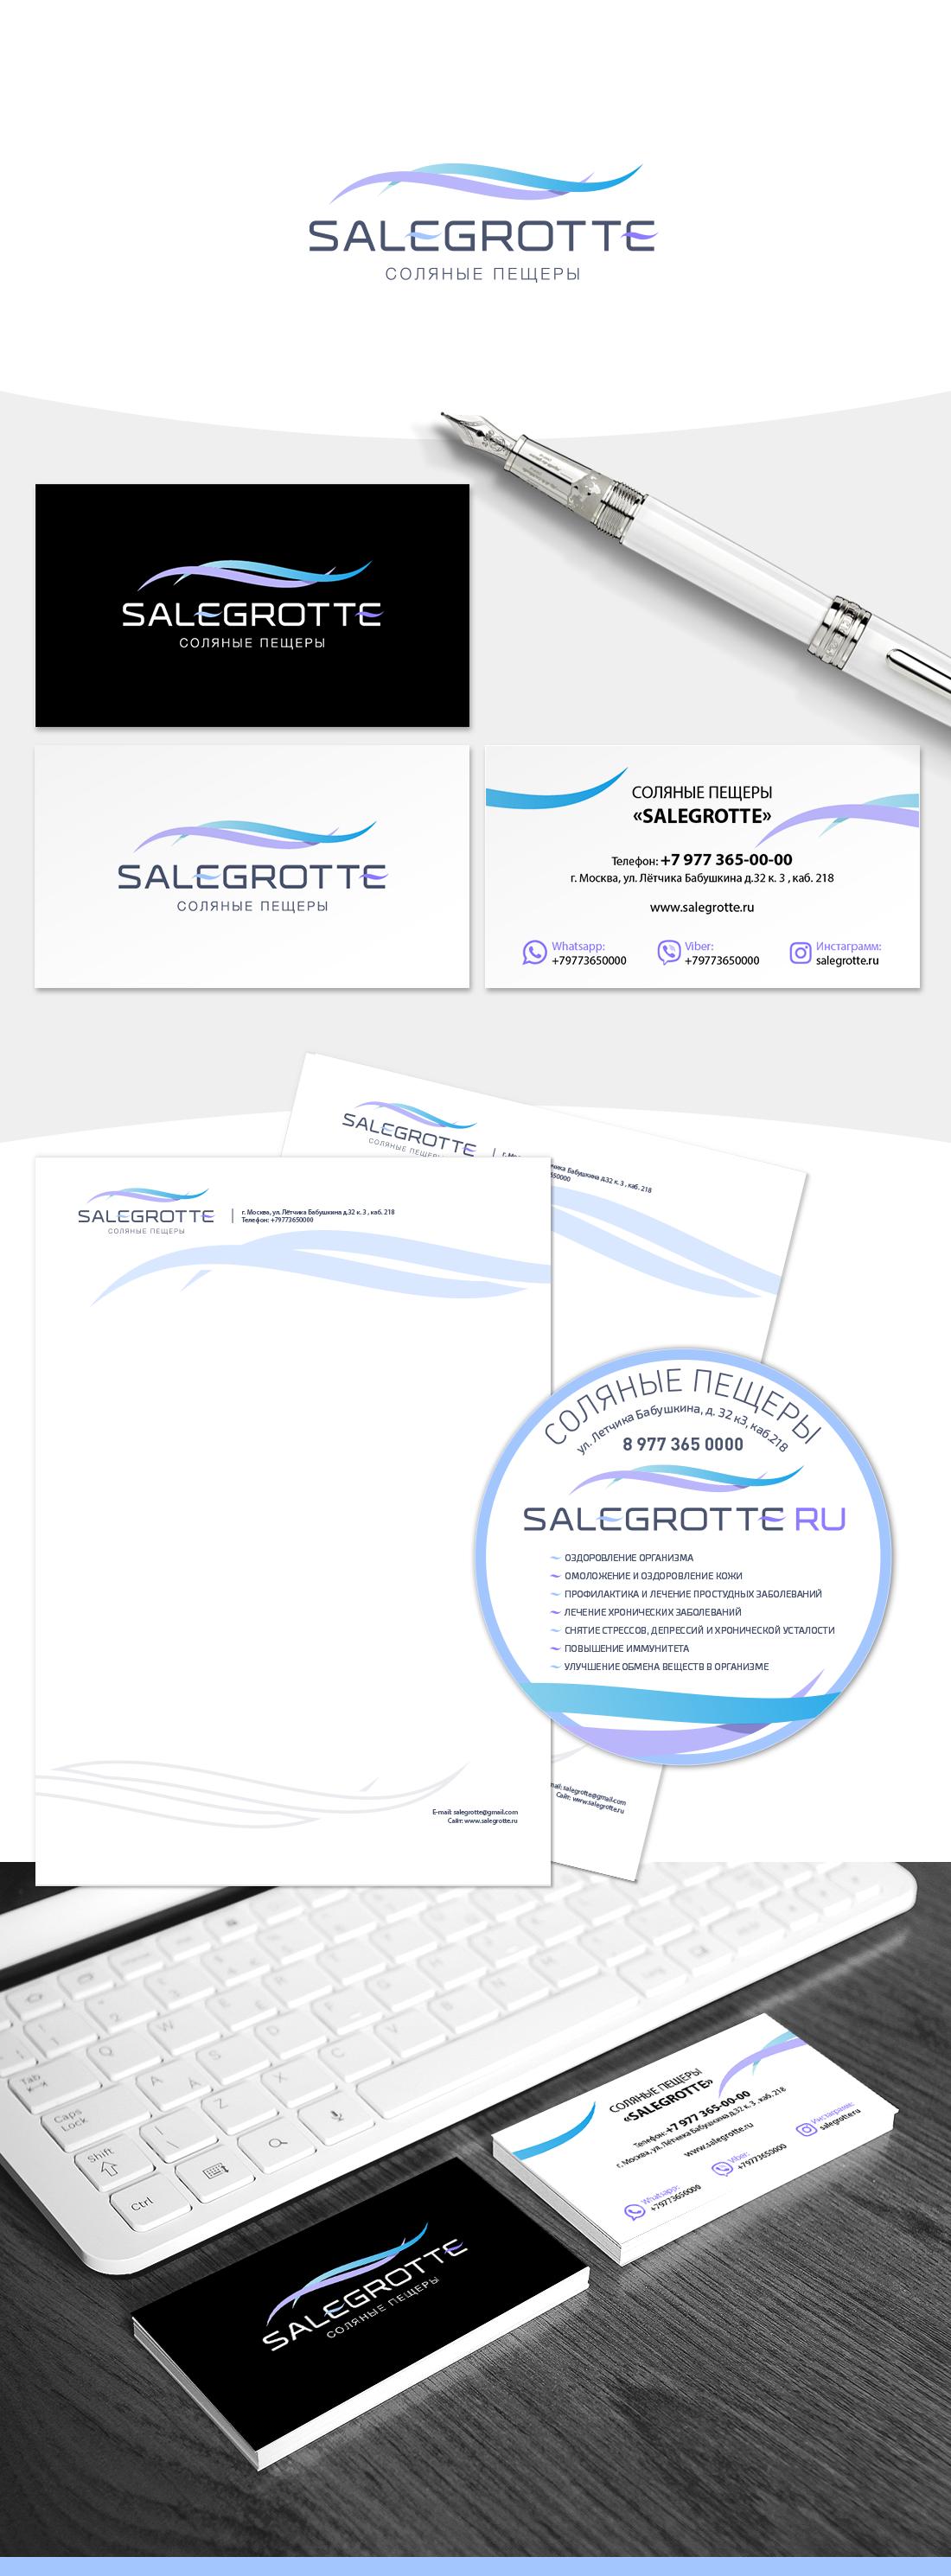 Salegrotte - соляные пещеры